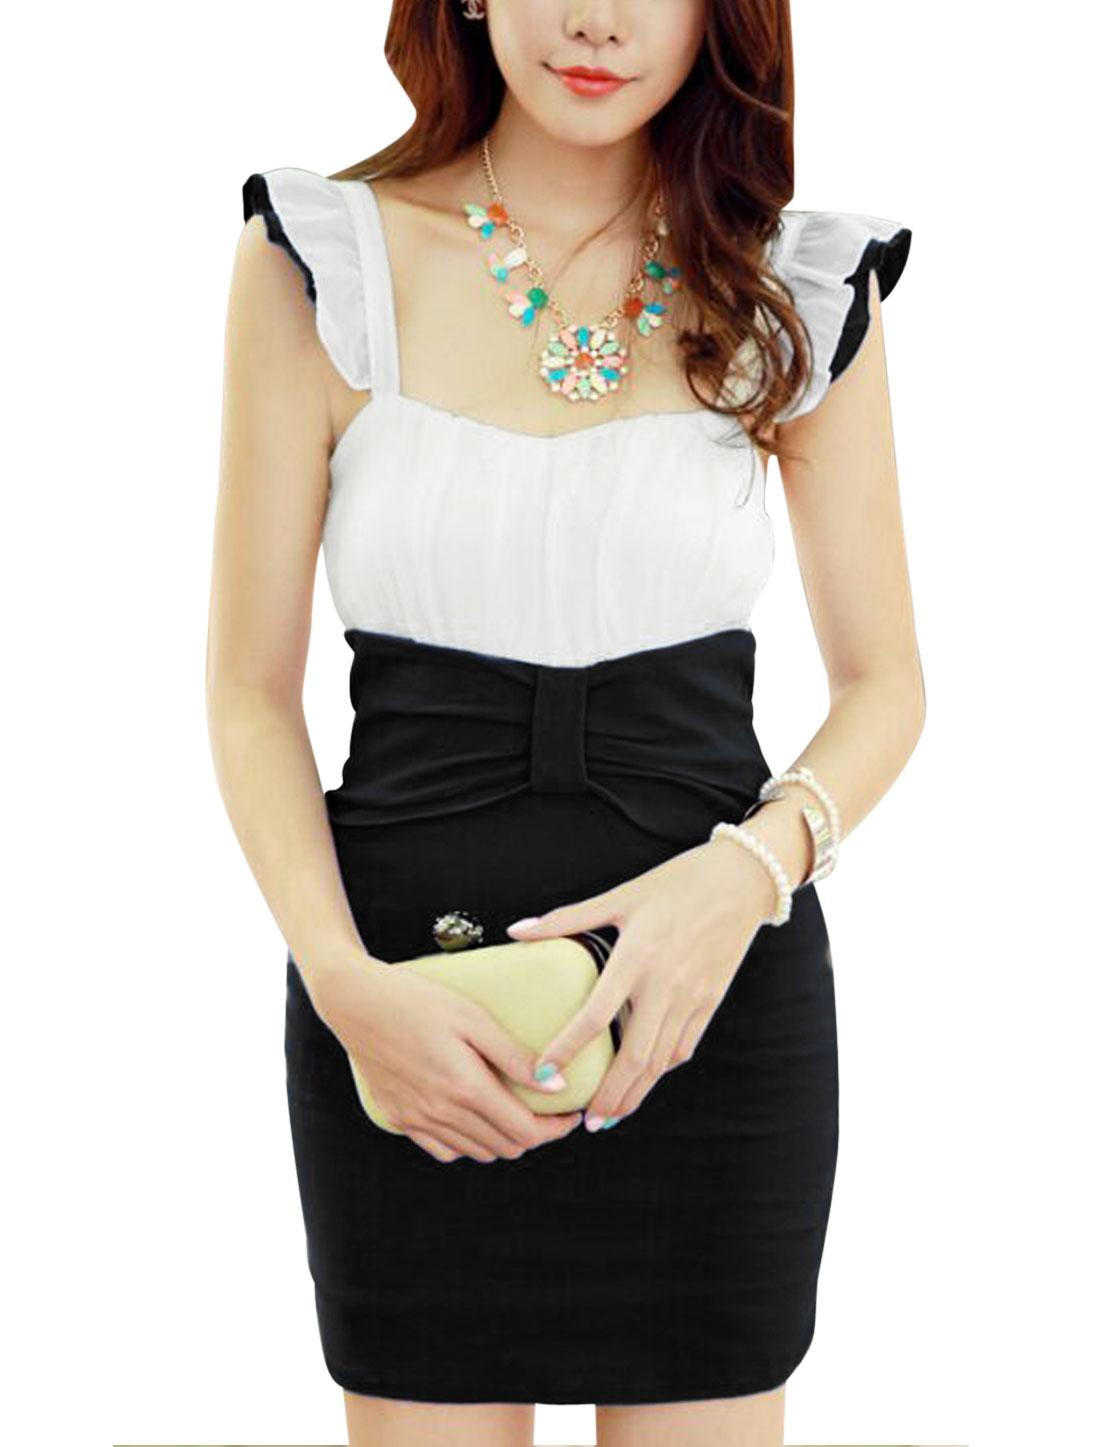 Lady Ruffled Tiered Shoulder Straps Chiffon Splicing Dress Black XS